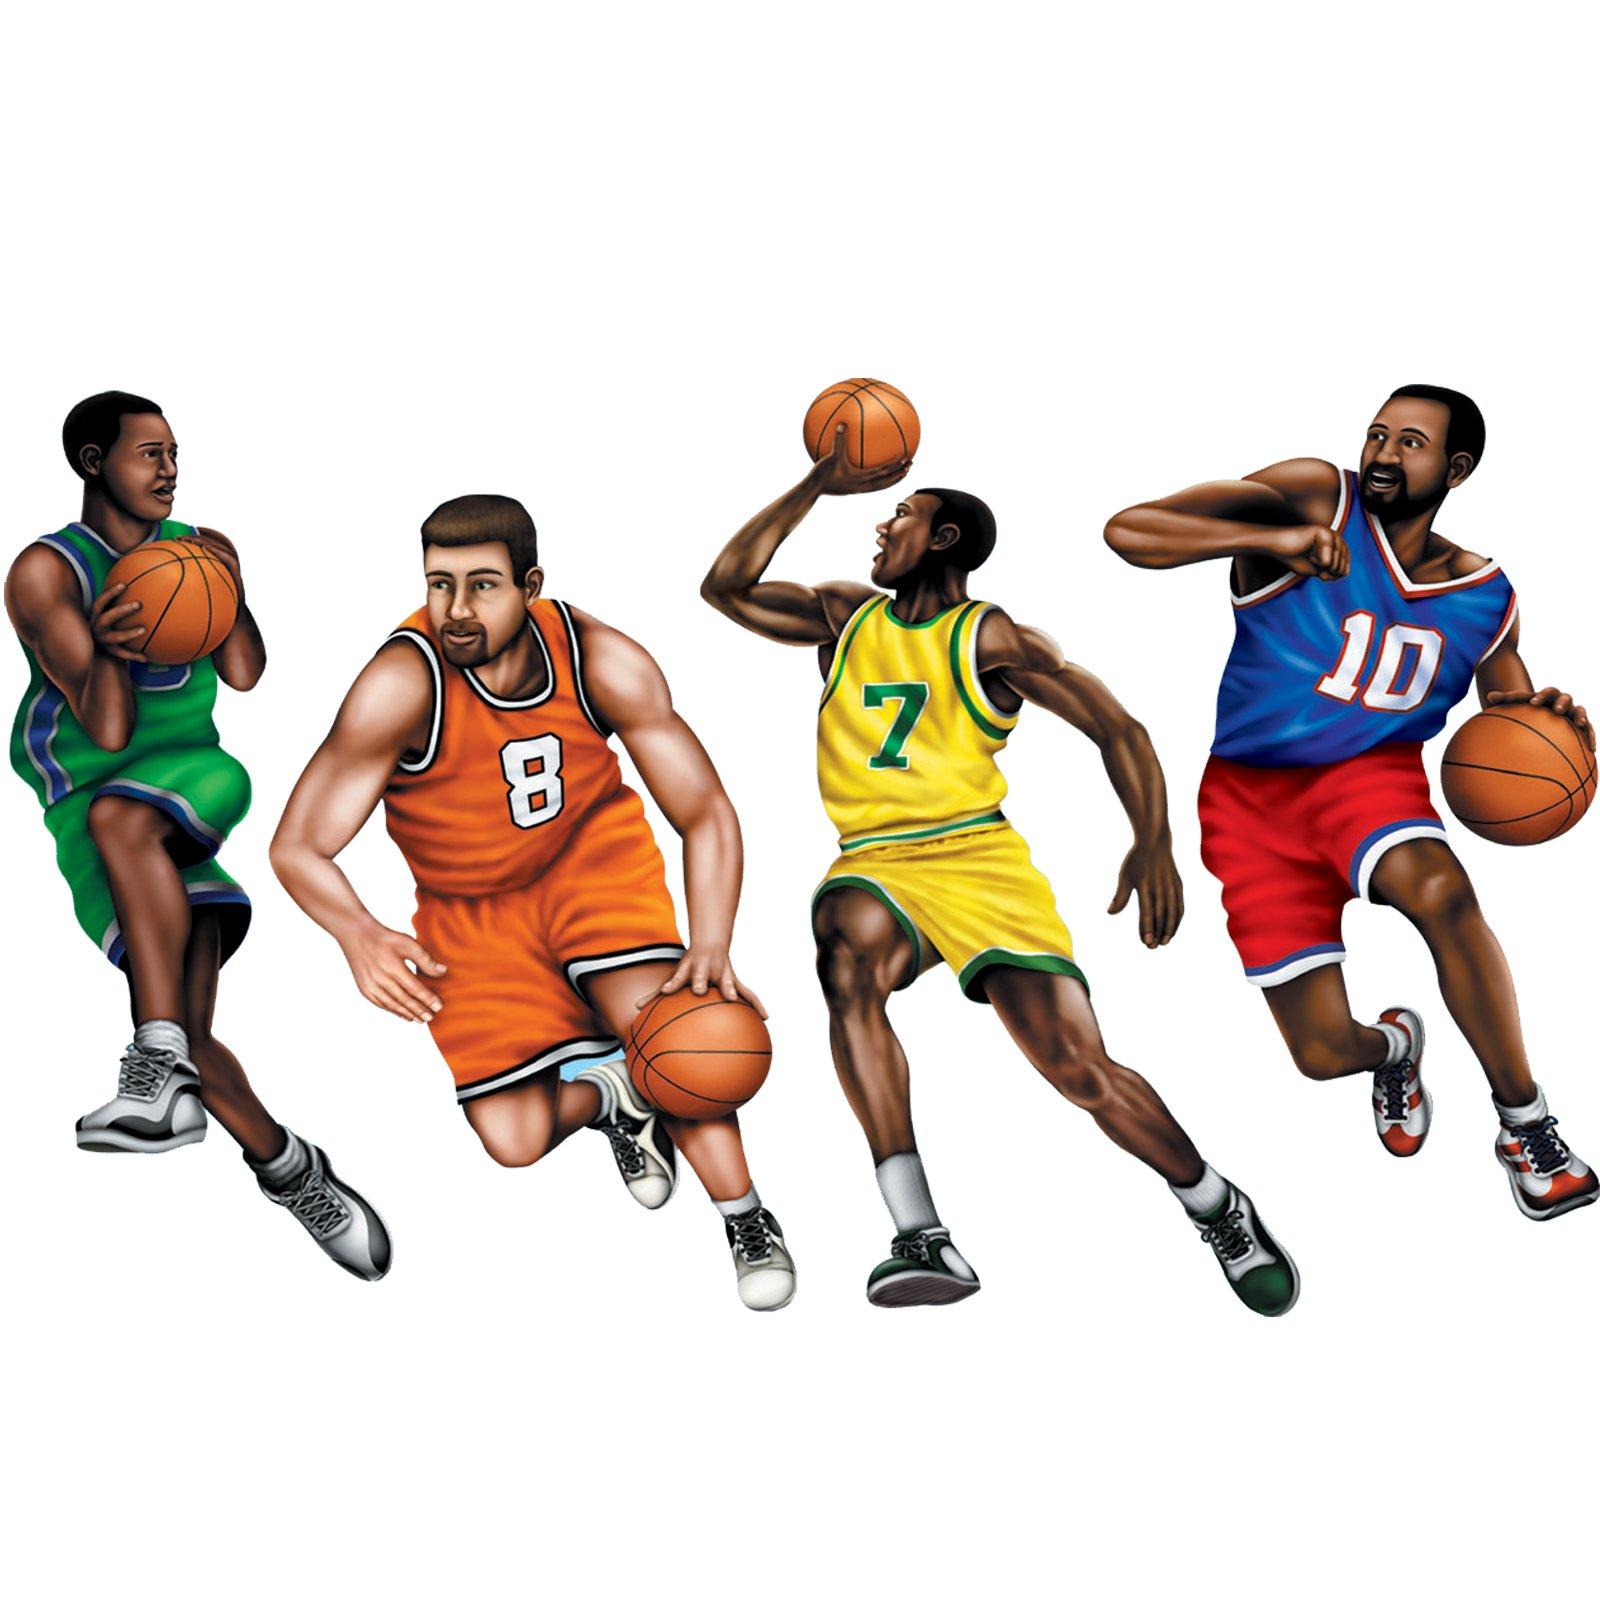 Hd clipart nba players - Basketball Players PNG HD